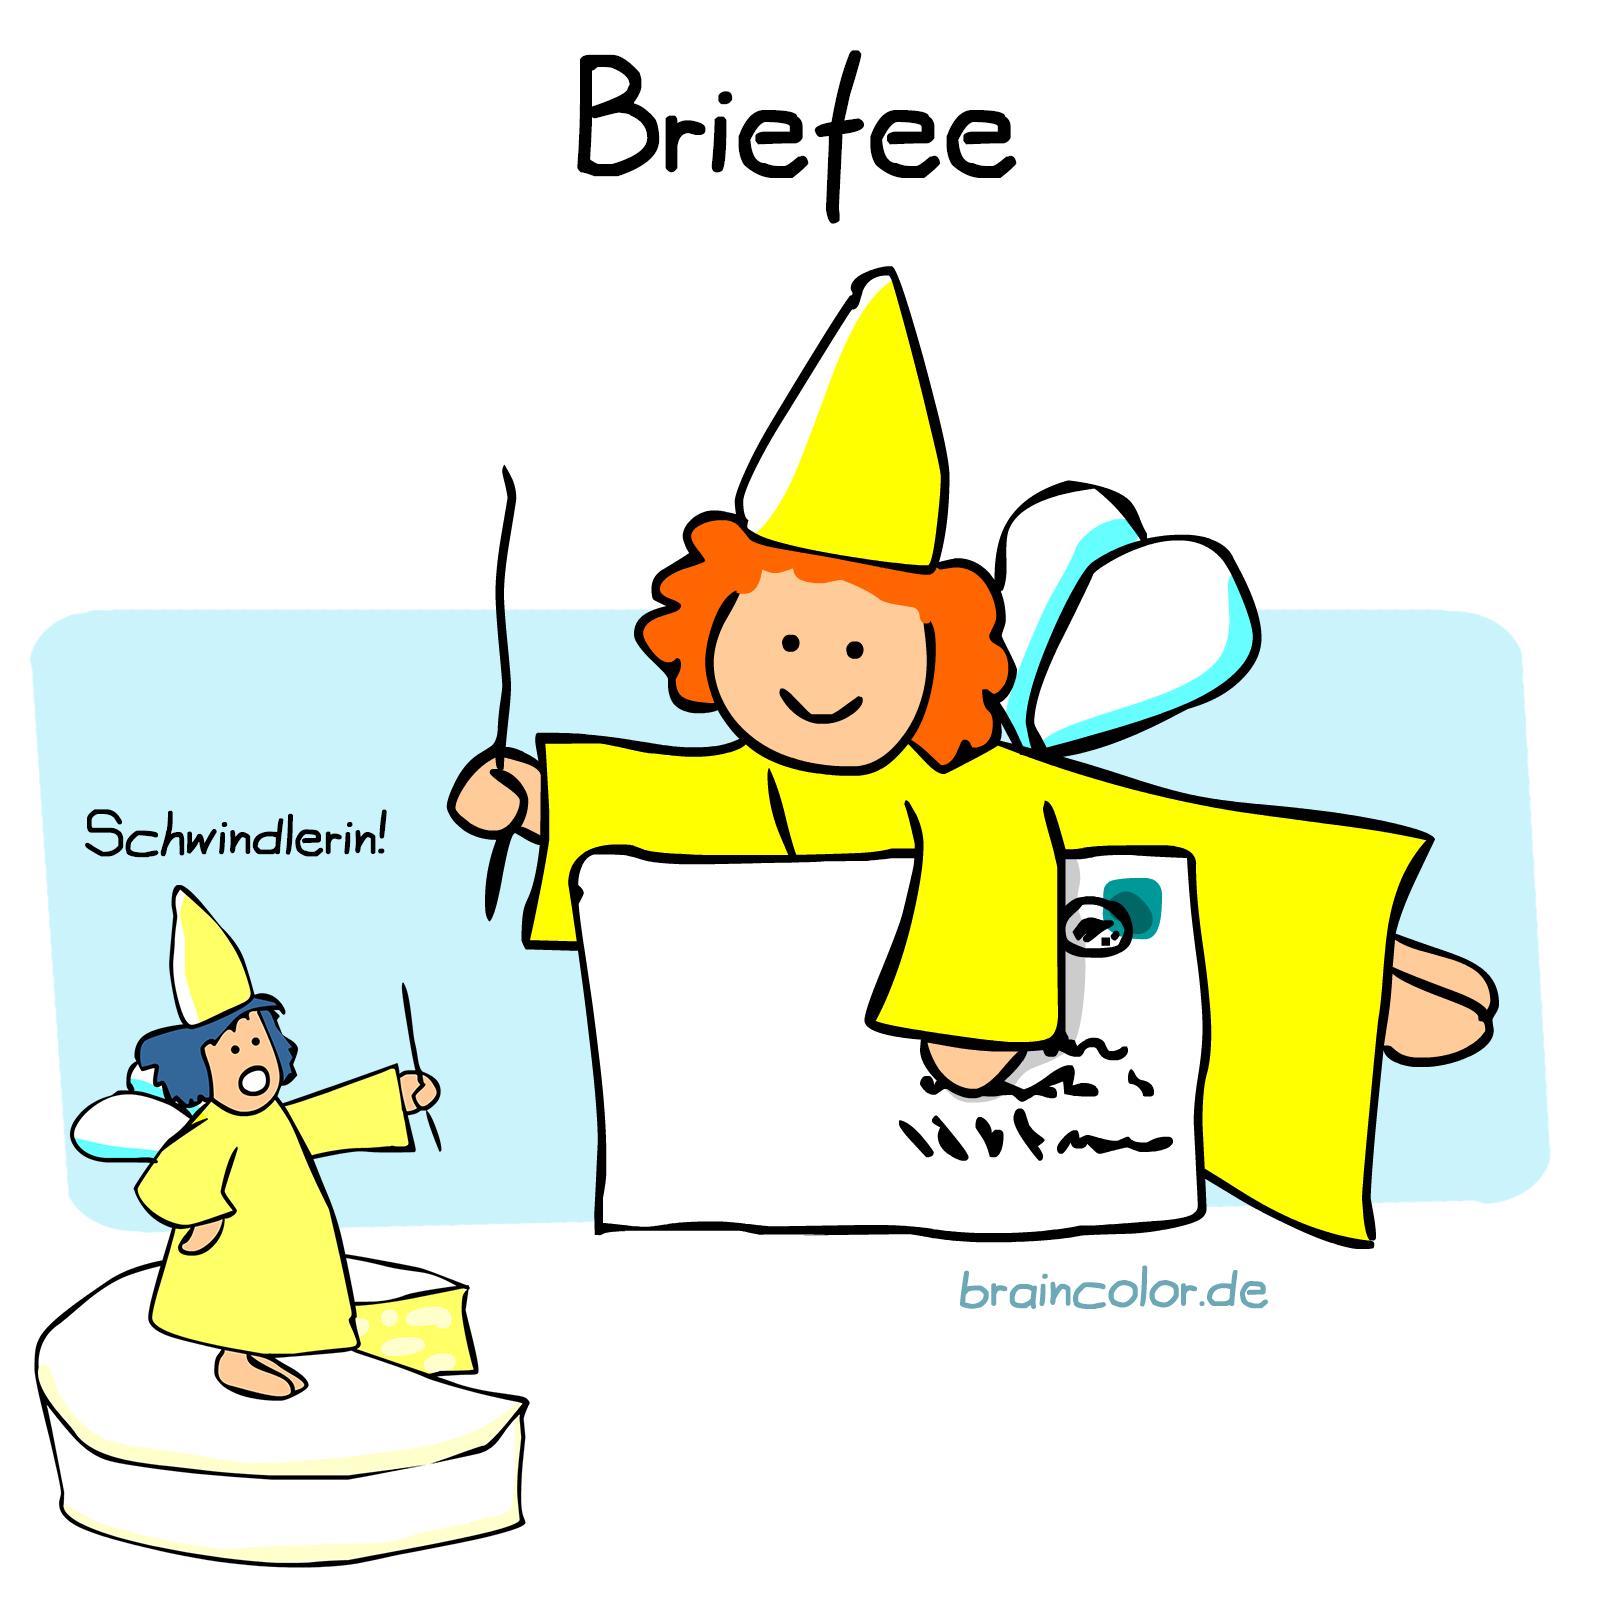 briefee